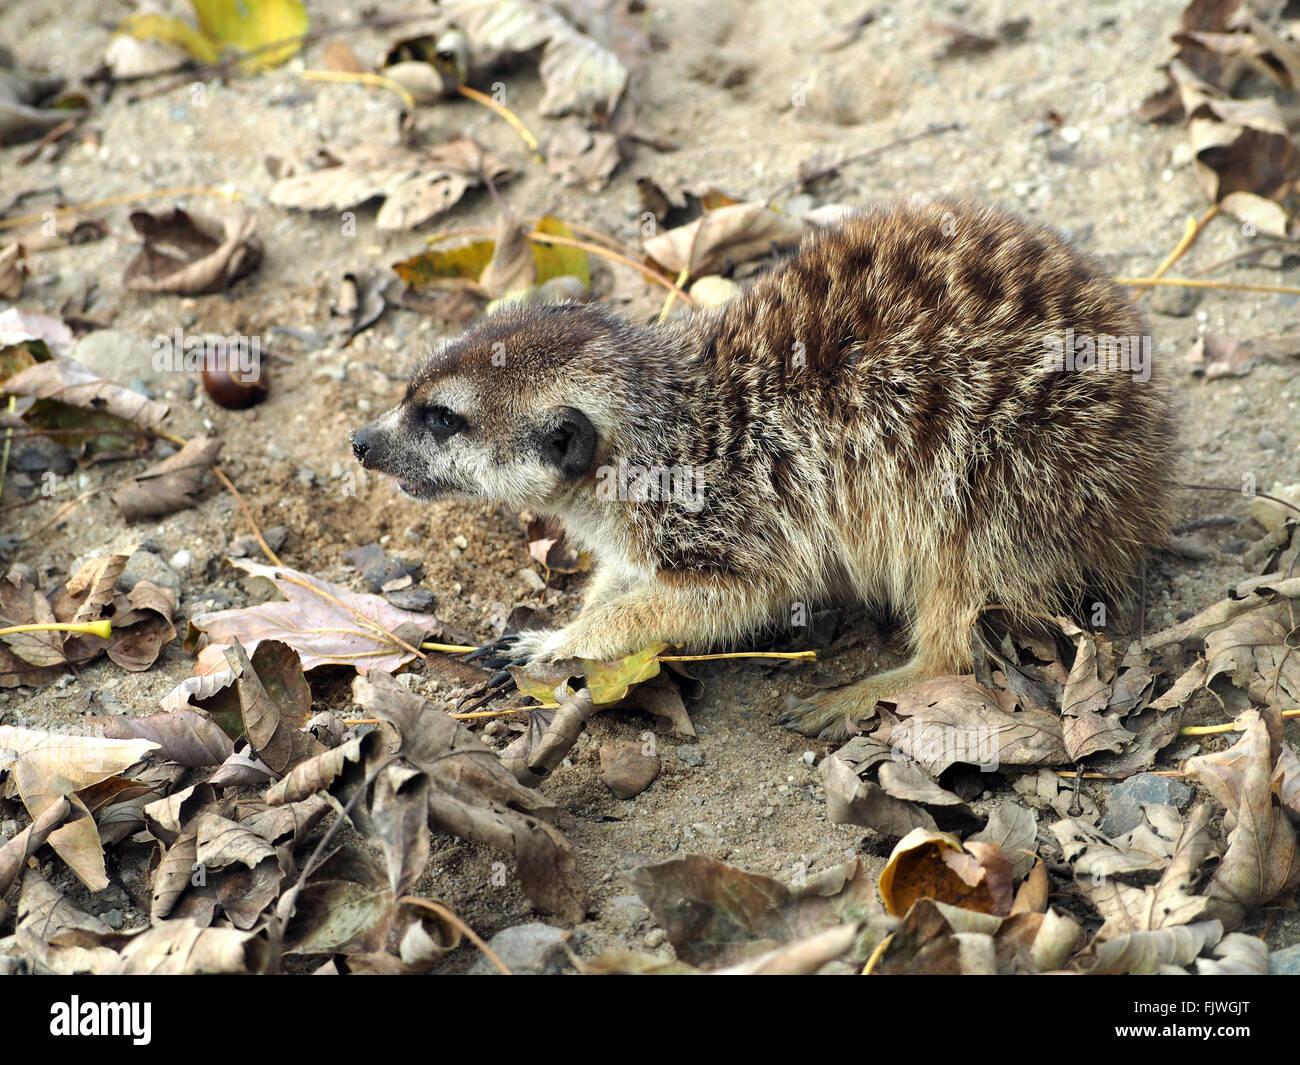 High Angle View Of Meerkat sur terrain malpropre Photo Stock